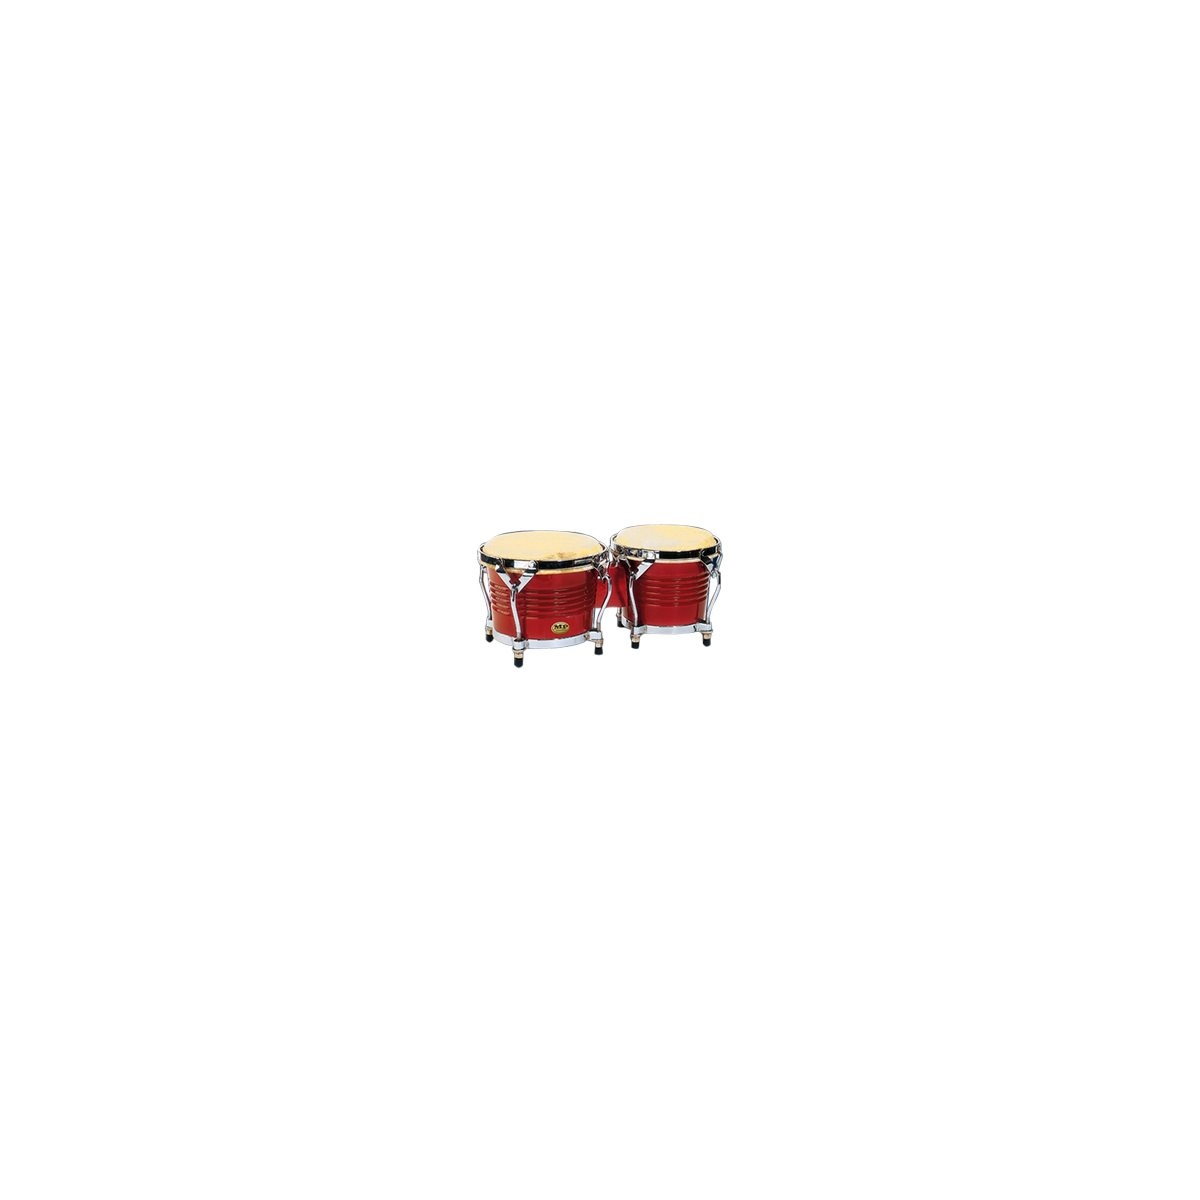 MANO - MP1778-RW - 7 / 8 inch Bongo Set - Red Wood